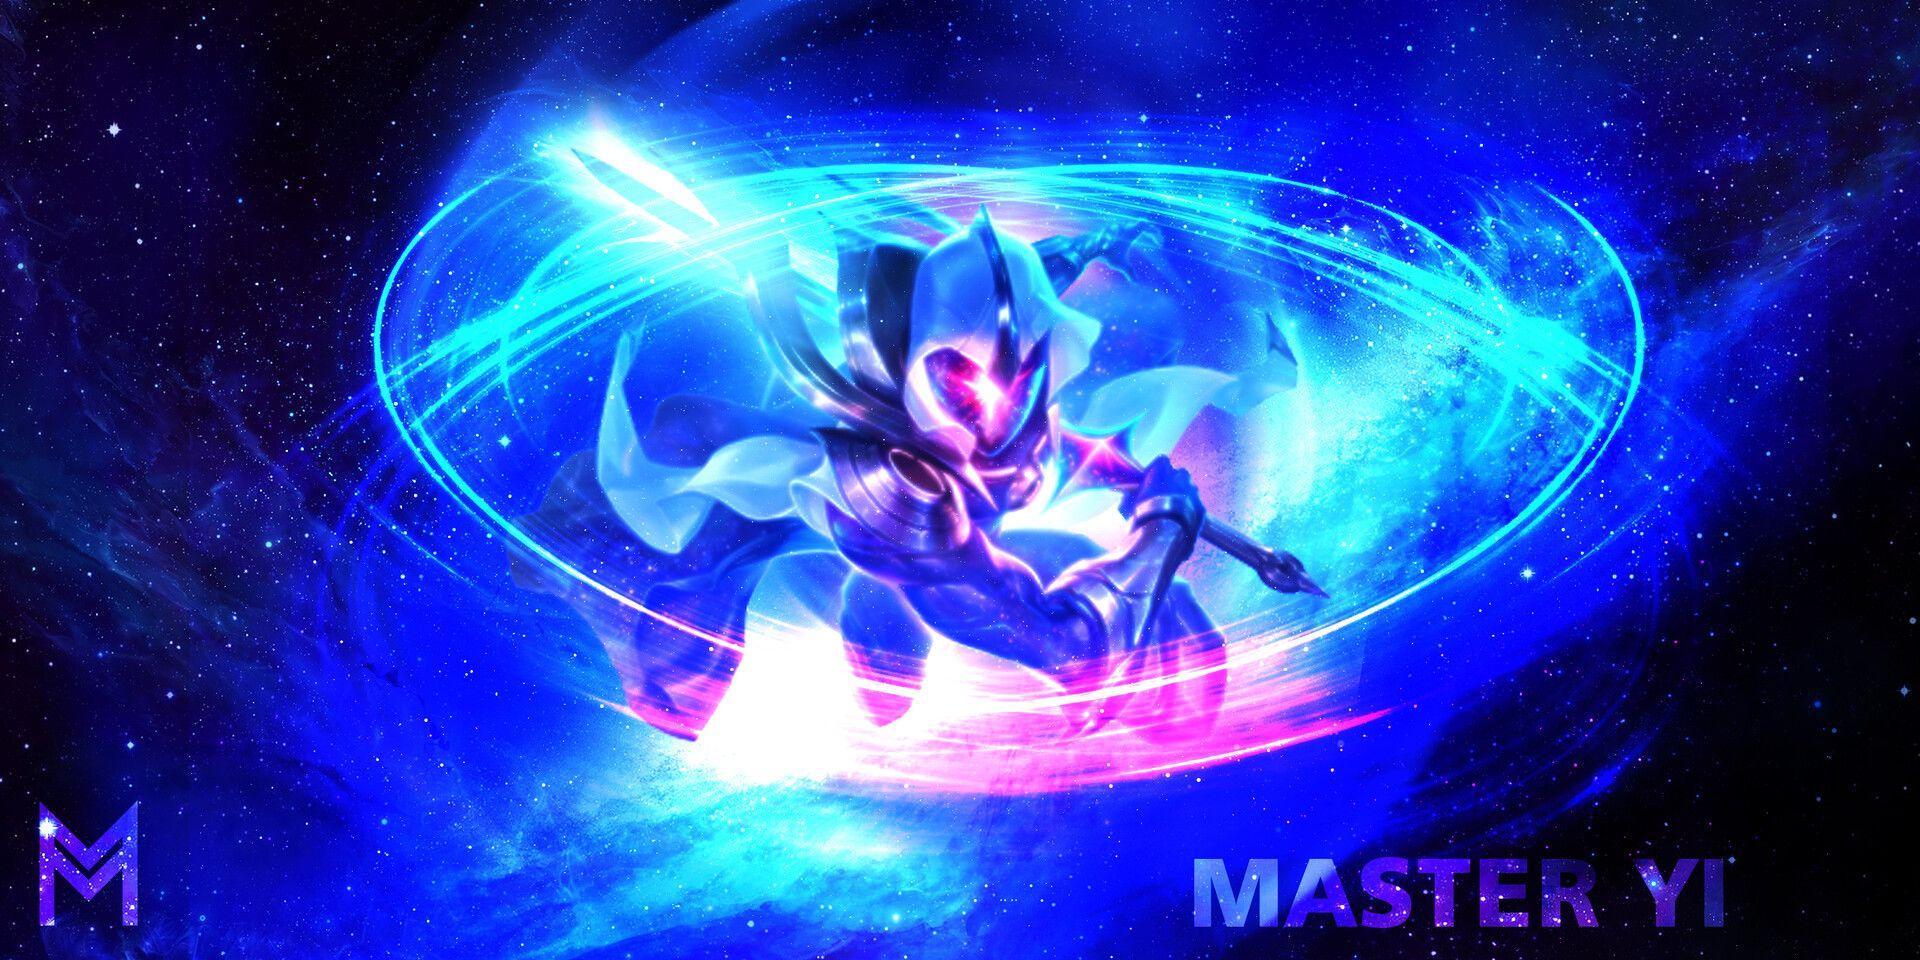 Master Yi Wallpapers Top Free Master Yi Backgrounds